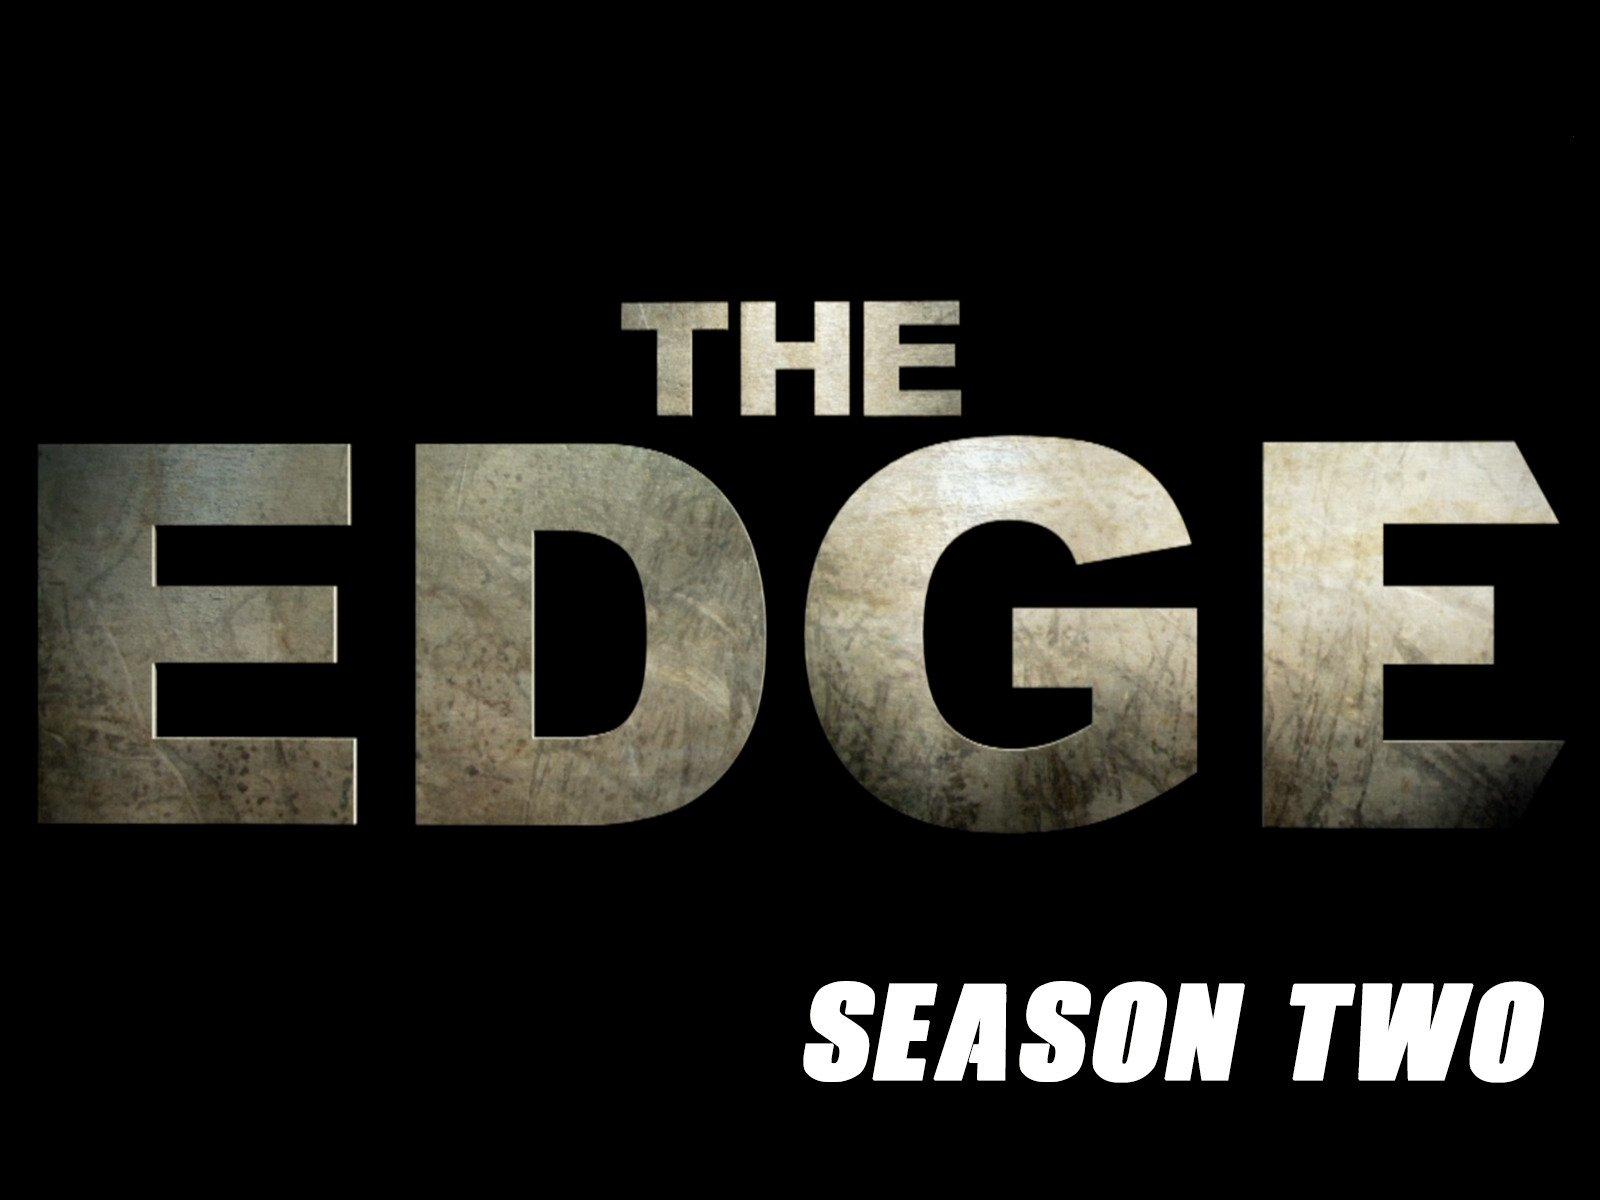 The Edge - Season 2